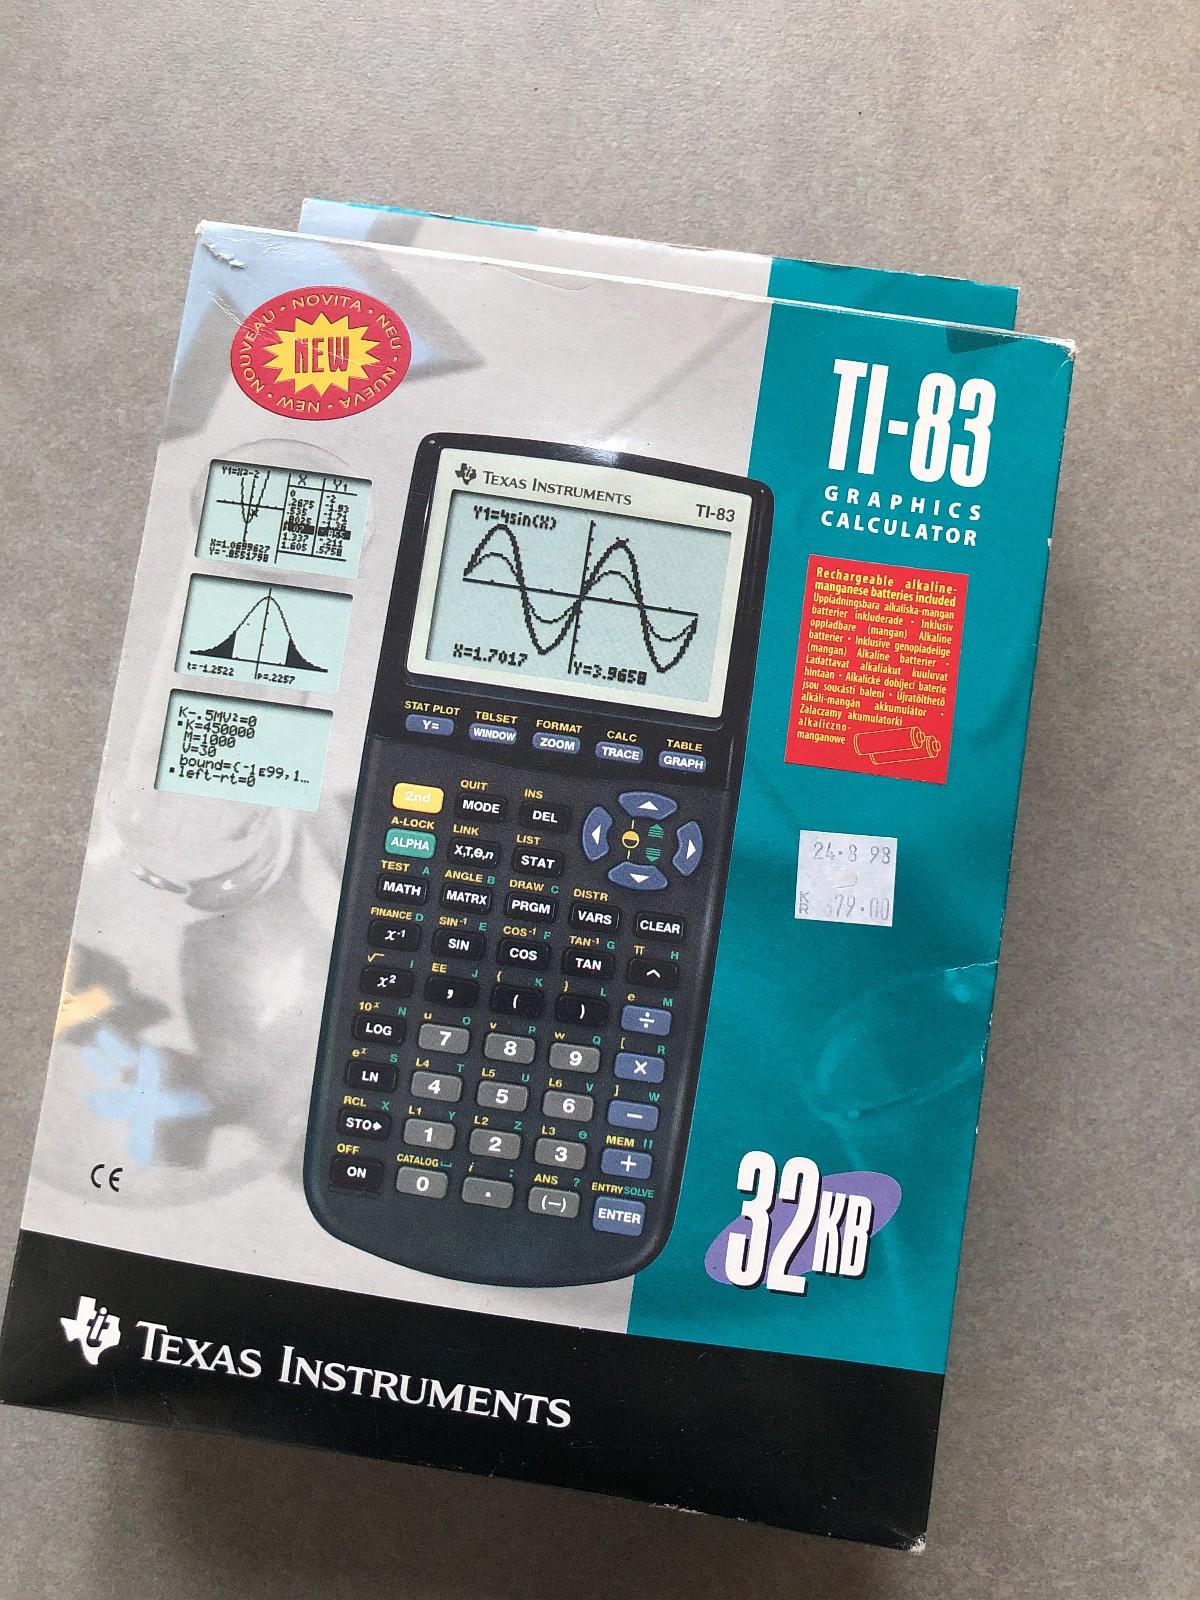 Kalkulator - Lillesand  - TI-83 Kalkulator. Regn enkelt ut brøk, kvaderatrot, kubikkrot osv med grafer. Et must i skolesammenheng på ungdomskolen og videregående. Nypris 879,- - Lillesand